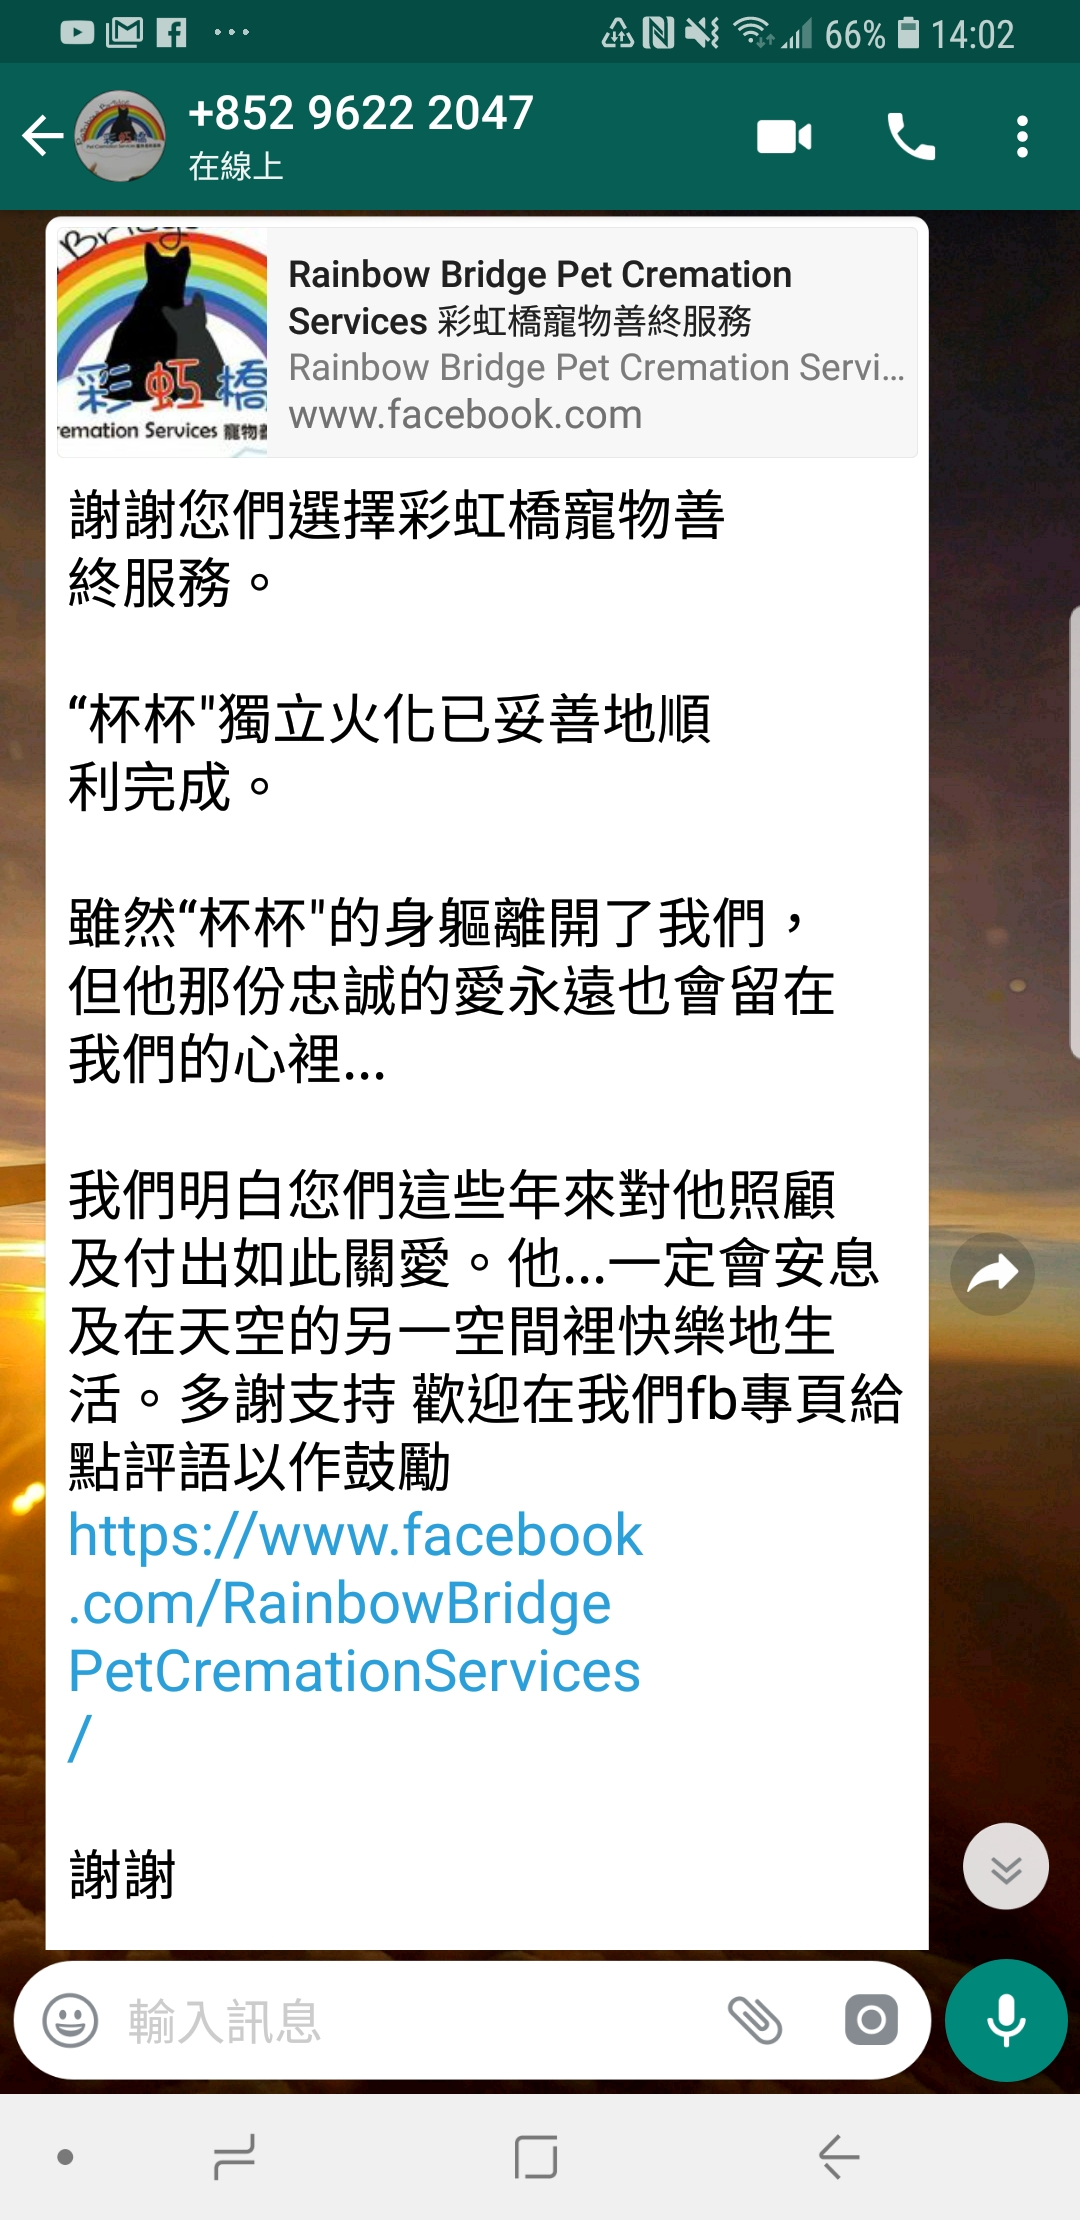 https://upload.cc/i1/2019/08/15/Vpz6rK.jpg